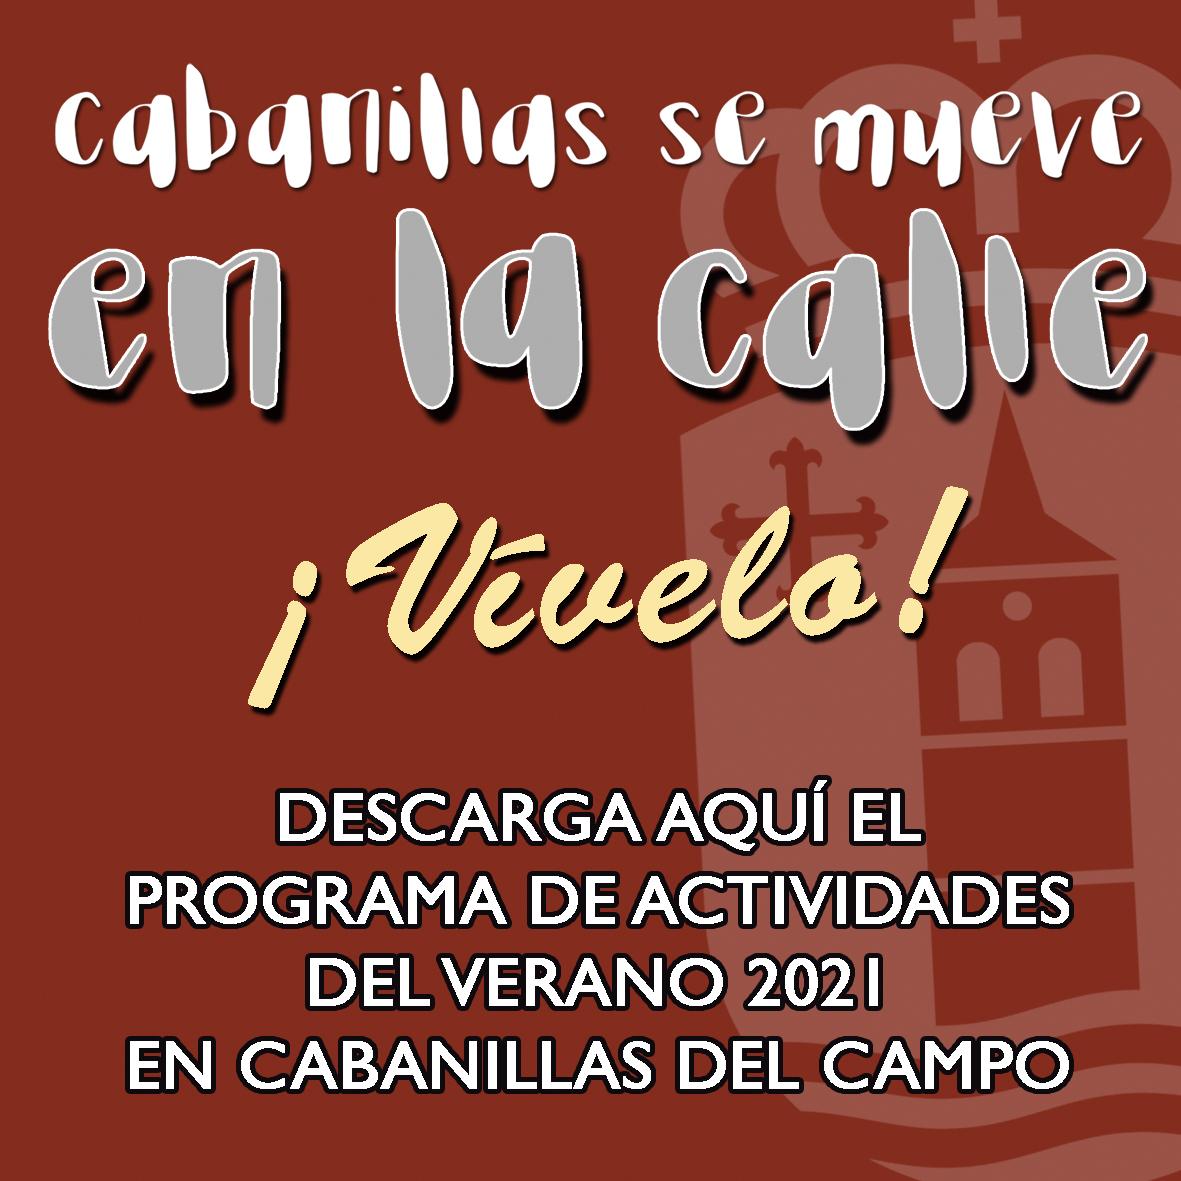 Programa Actividades cabanillas verano 2021